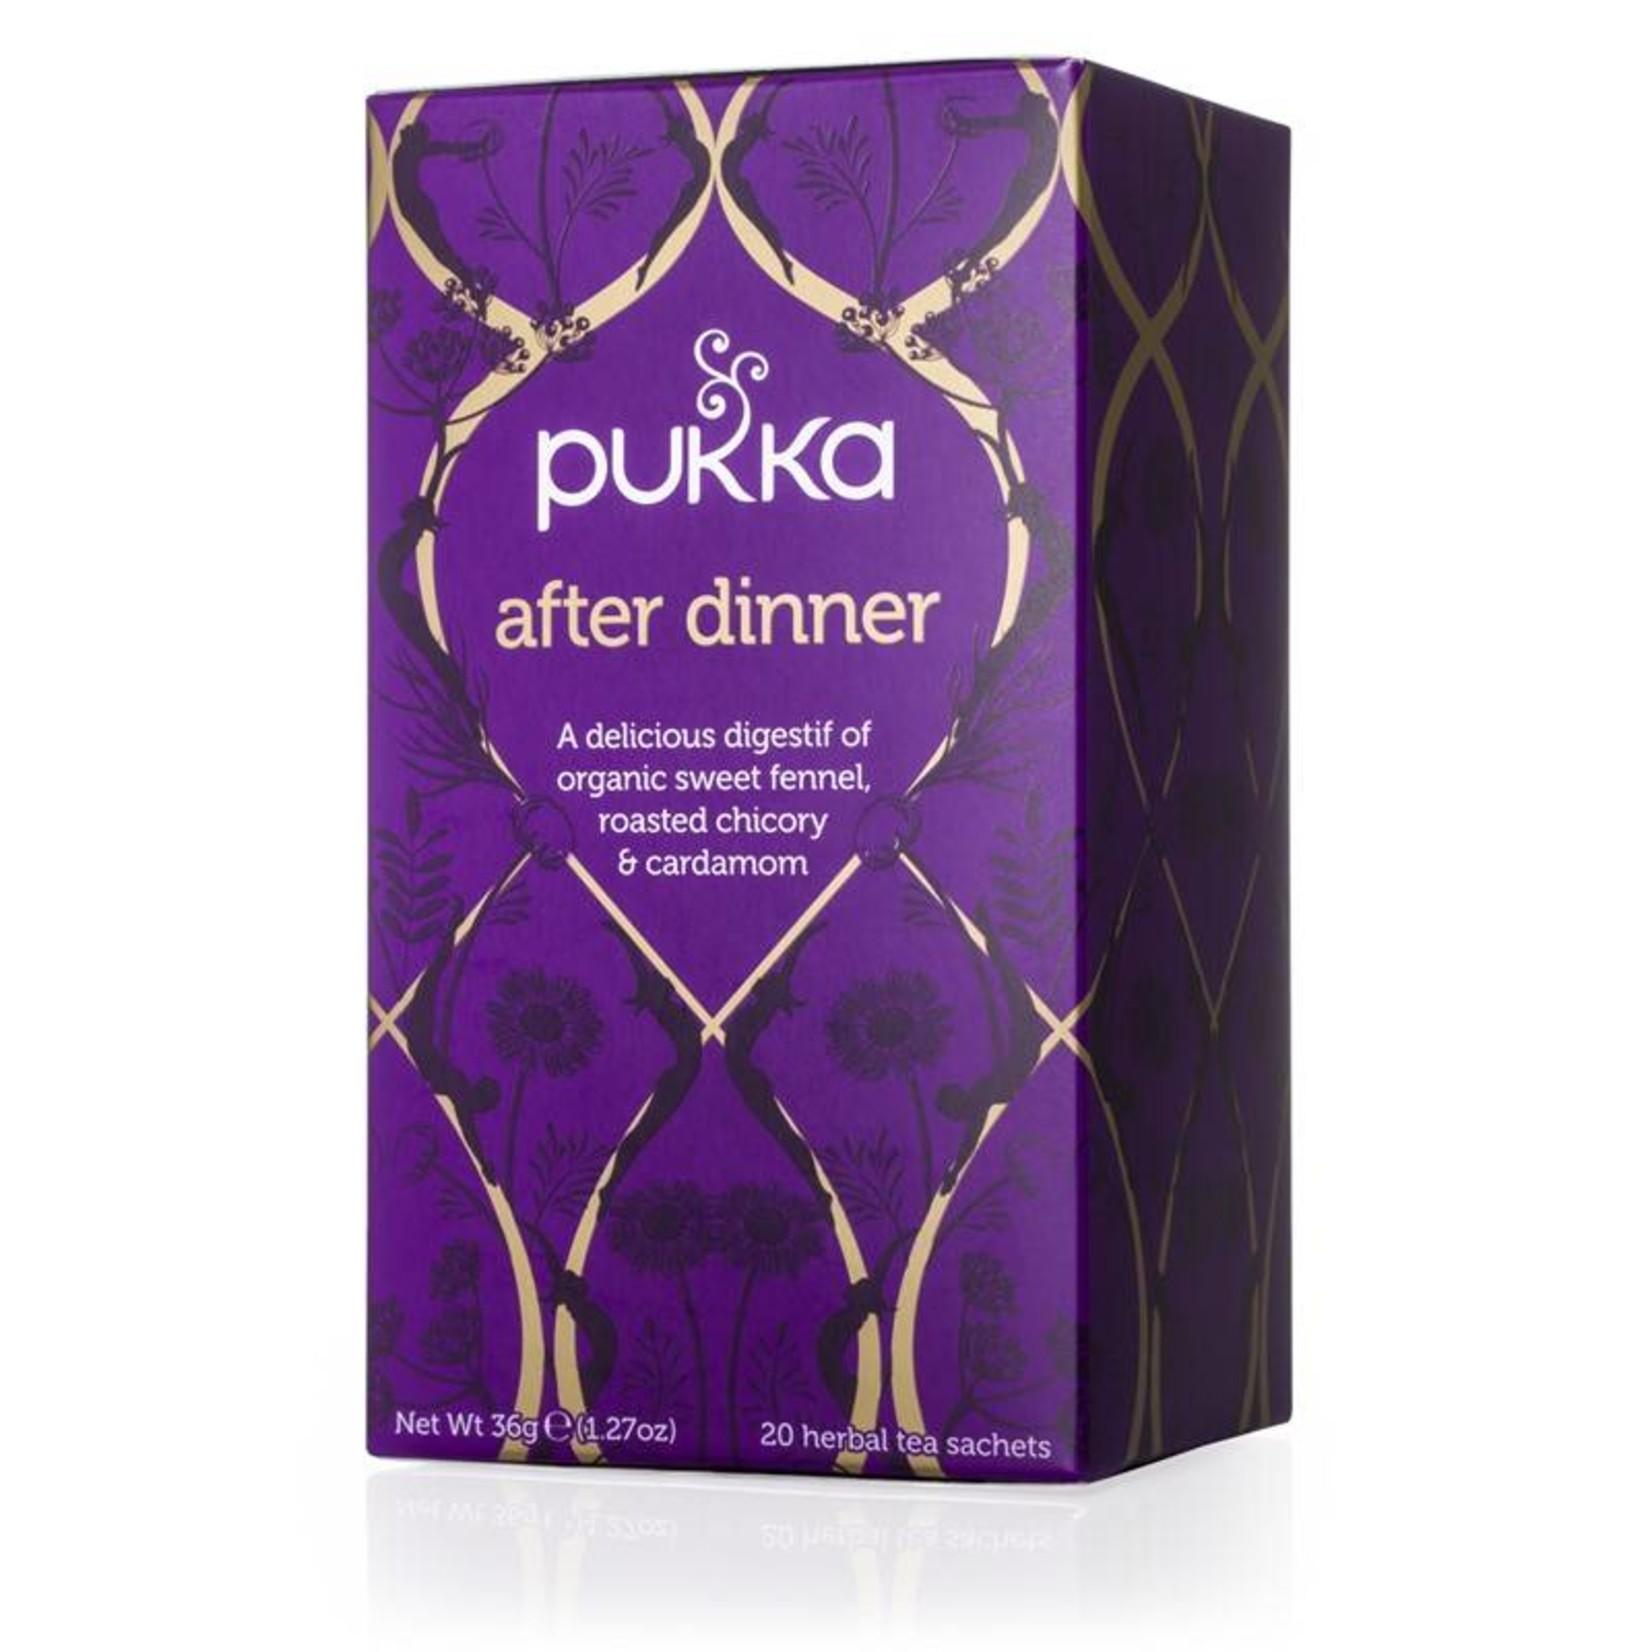 Pukka After Dinner 20 tea bags